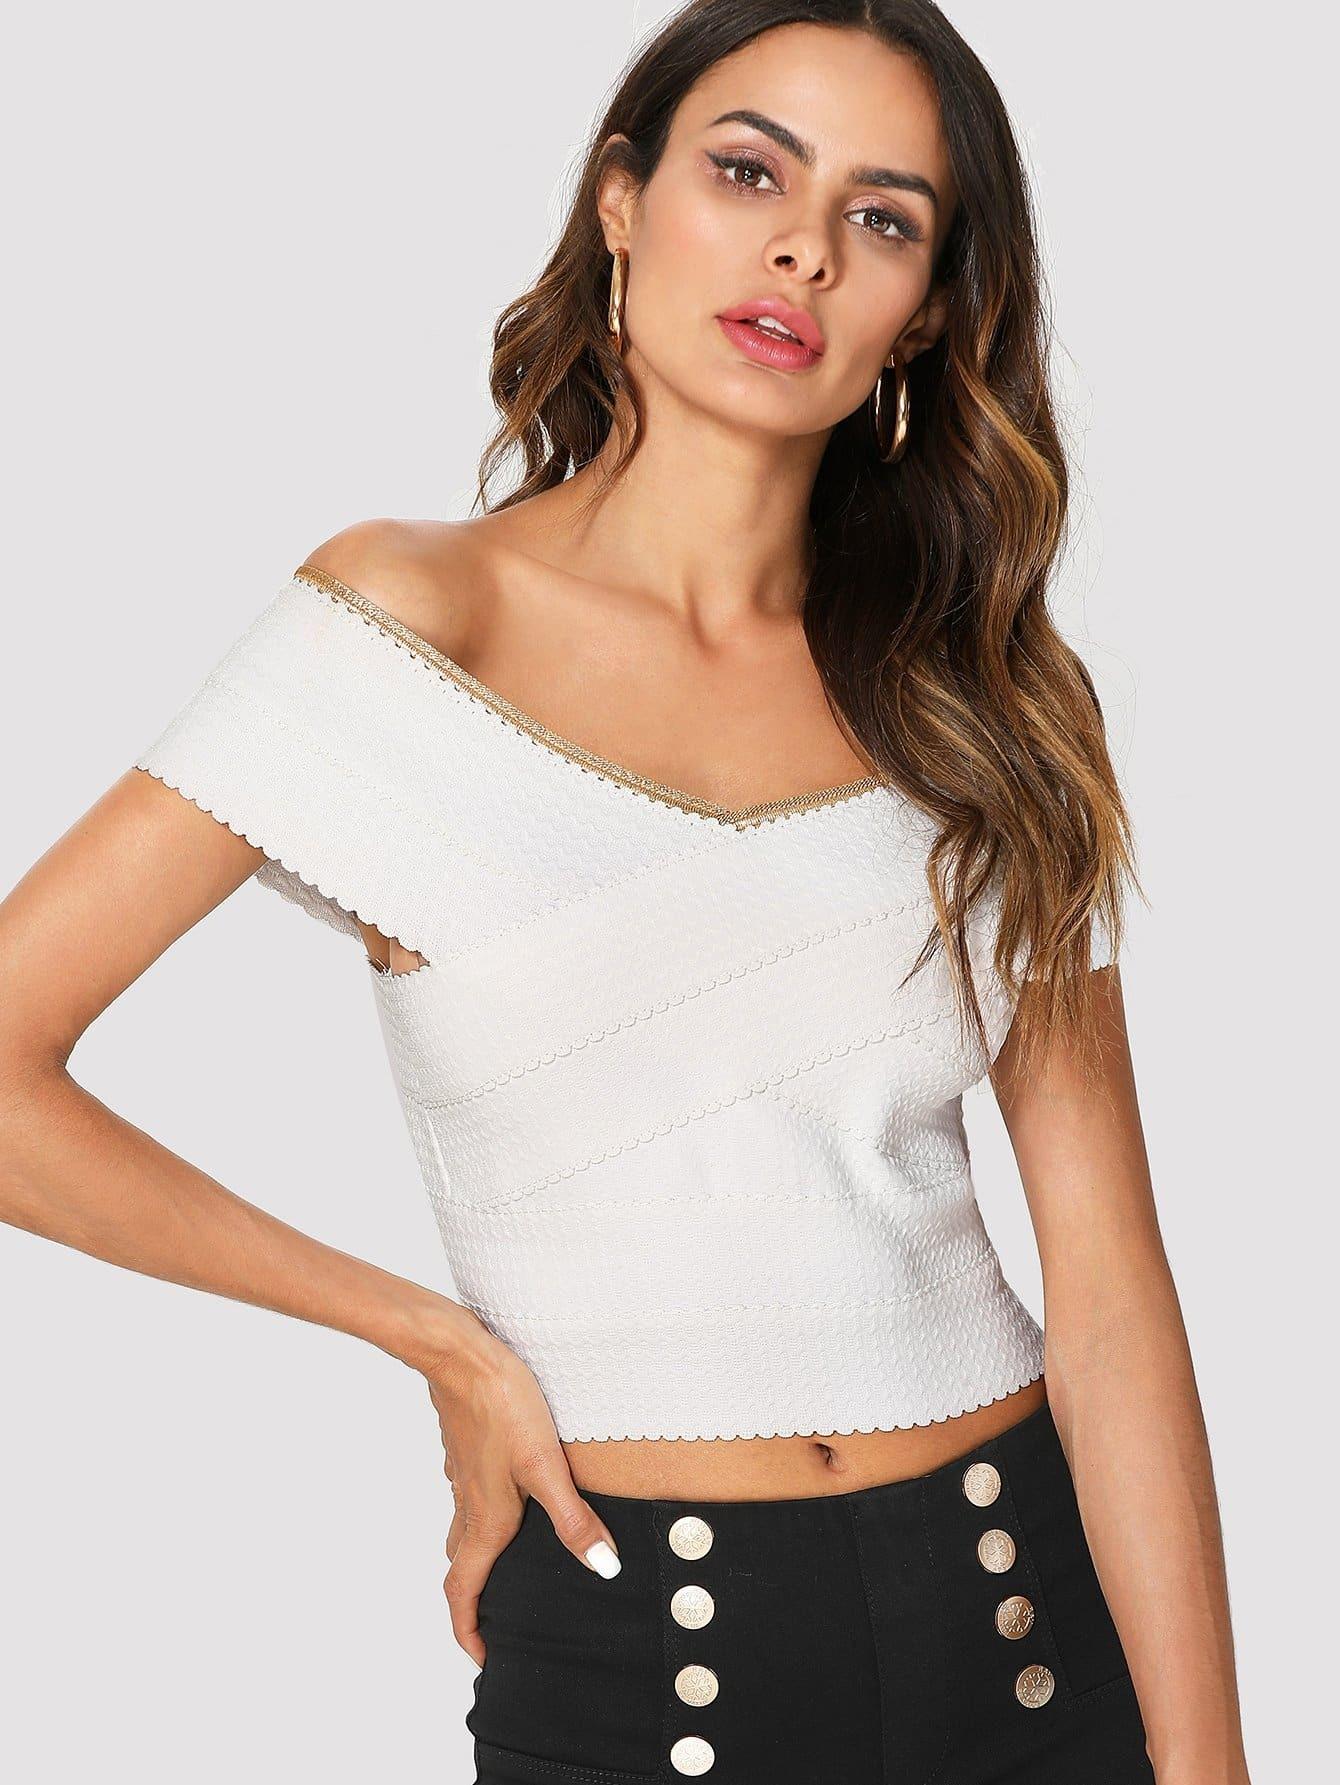 74c4dfe2ee7a7 Off Shoulder Zip Back Crop Top EmmaCloth-Women Fast Fashion Online